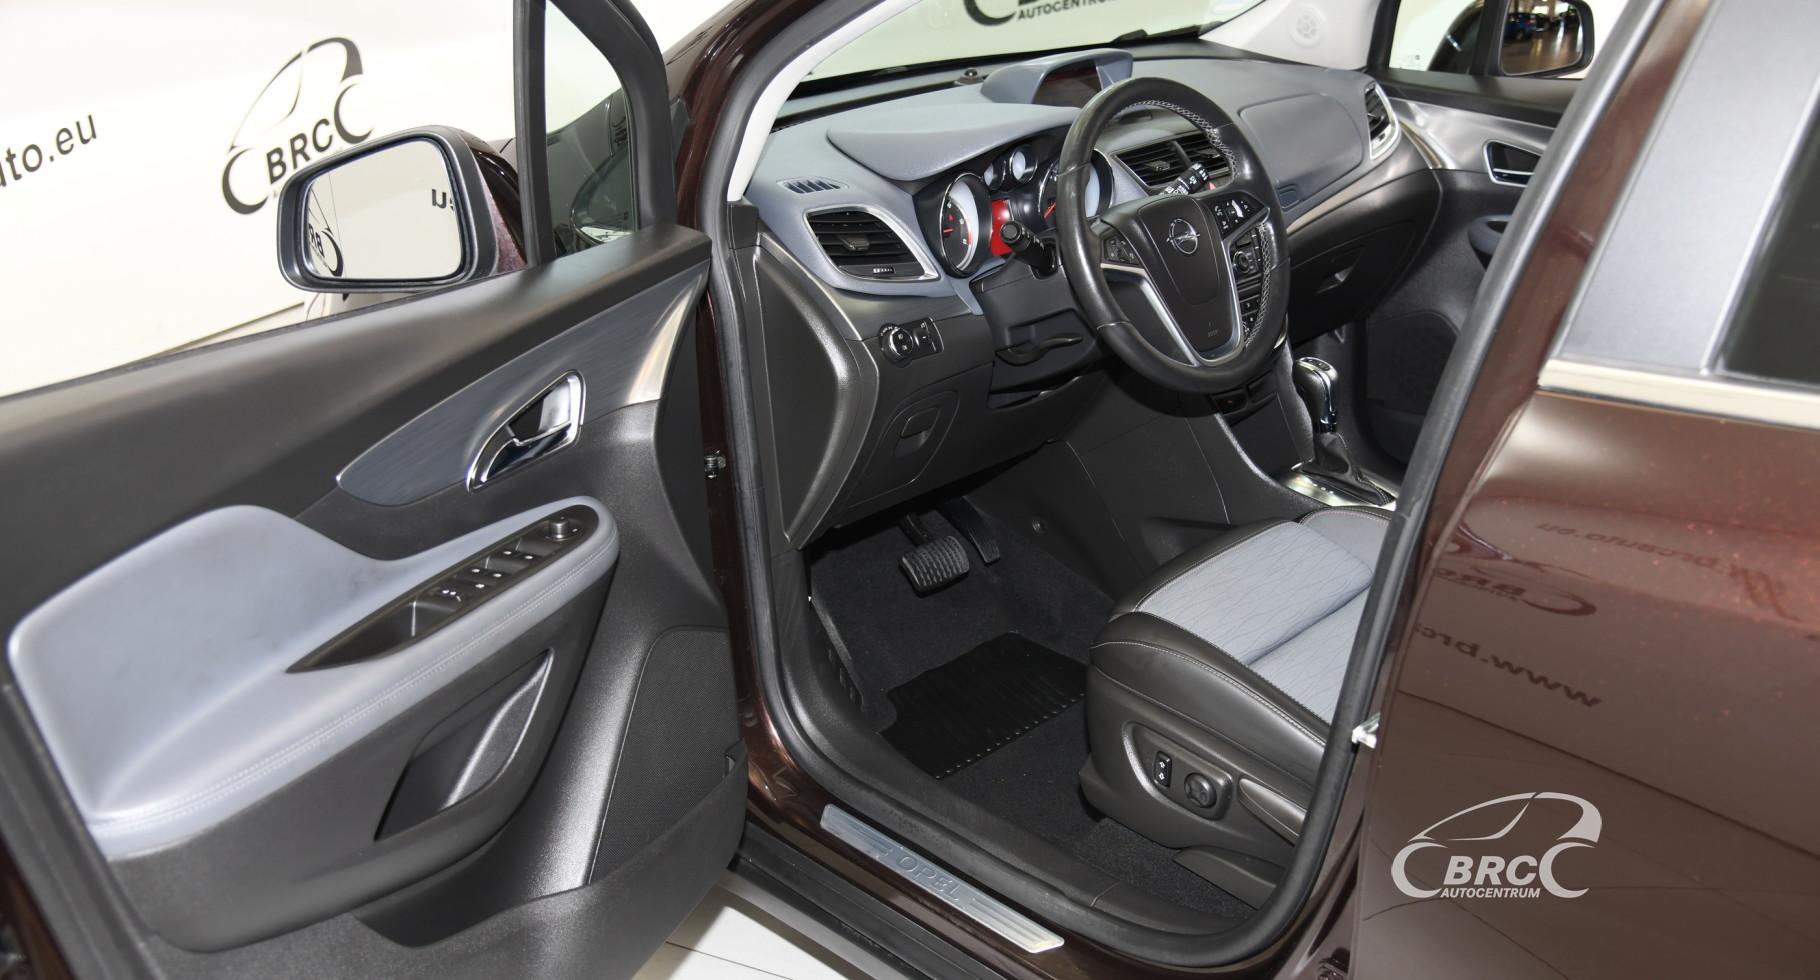 Opel Mokka 1.6 CDTI Automatas